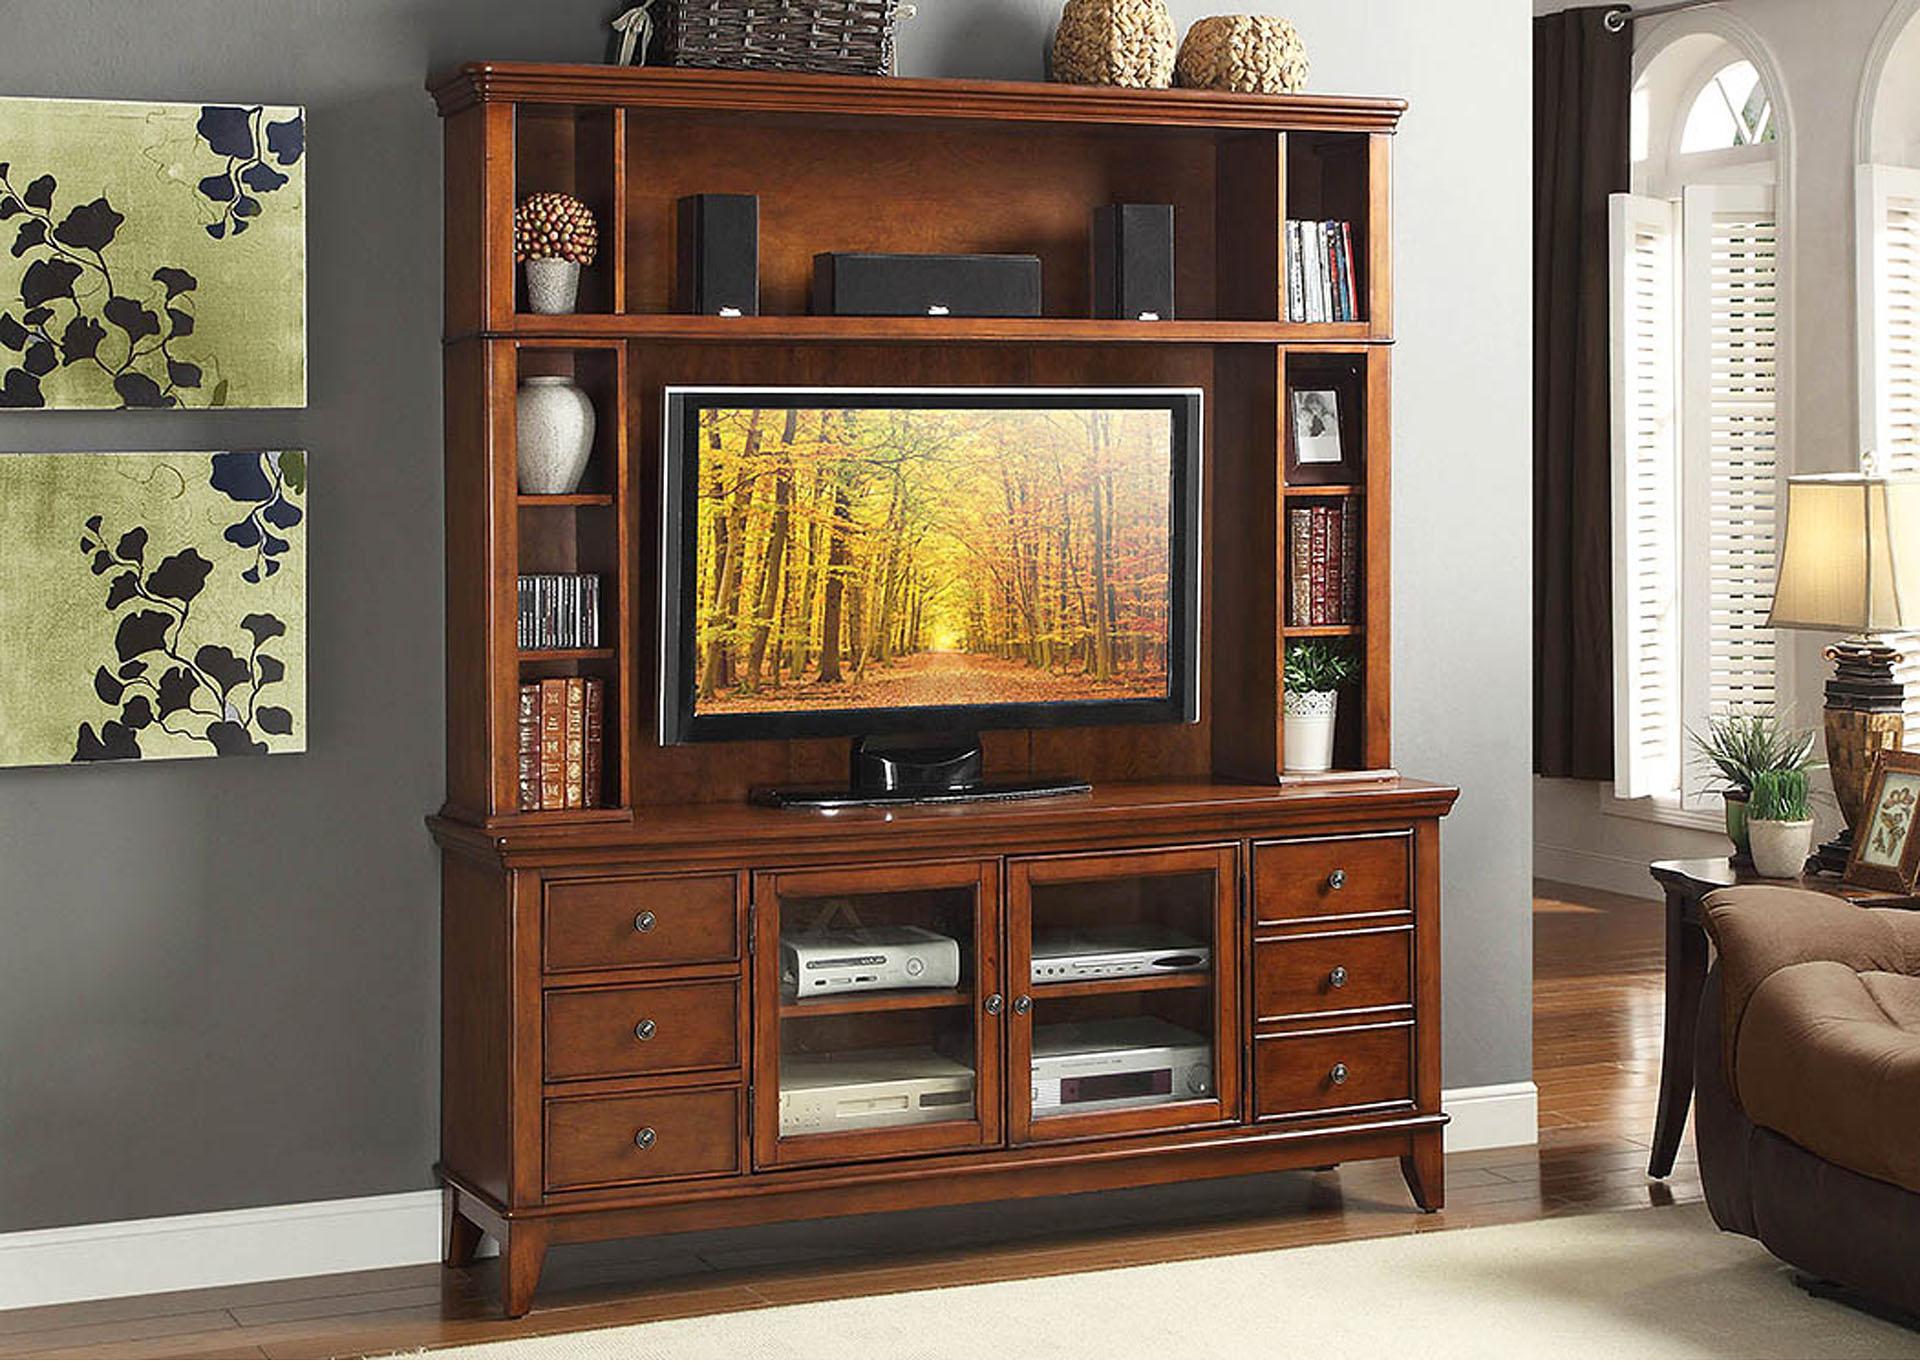 Best Buy Furniture And Mattress Culbert 60 Warm Cherry Tv Stand W 2